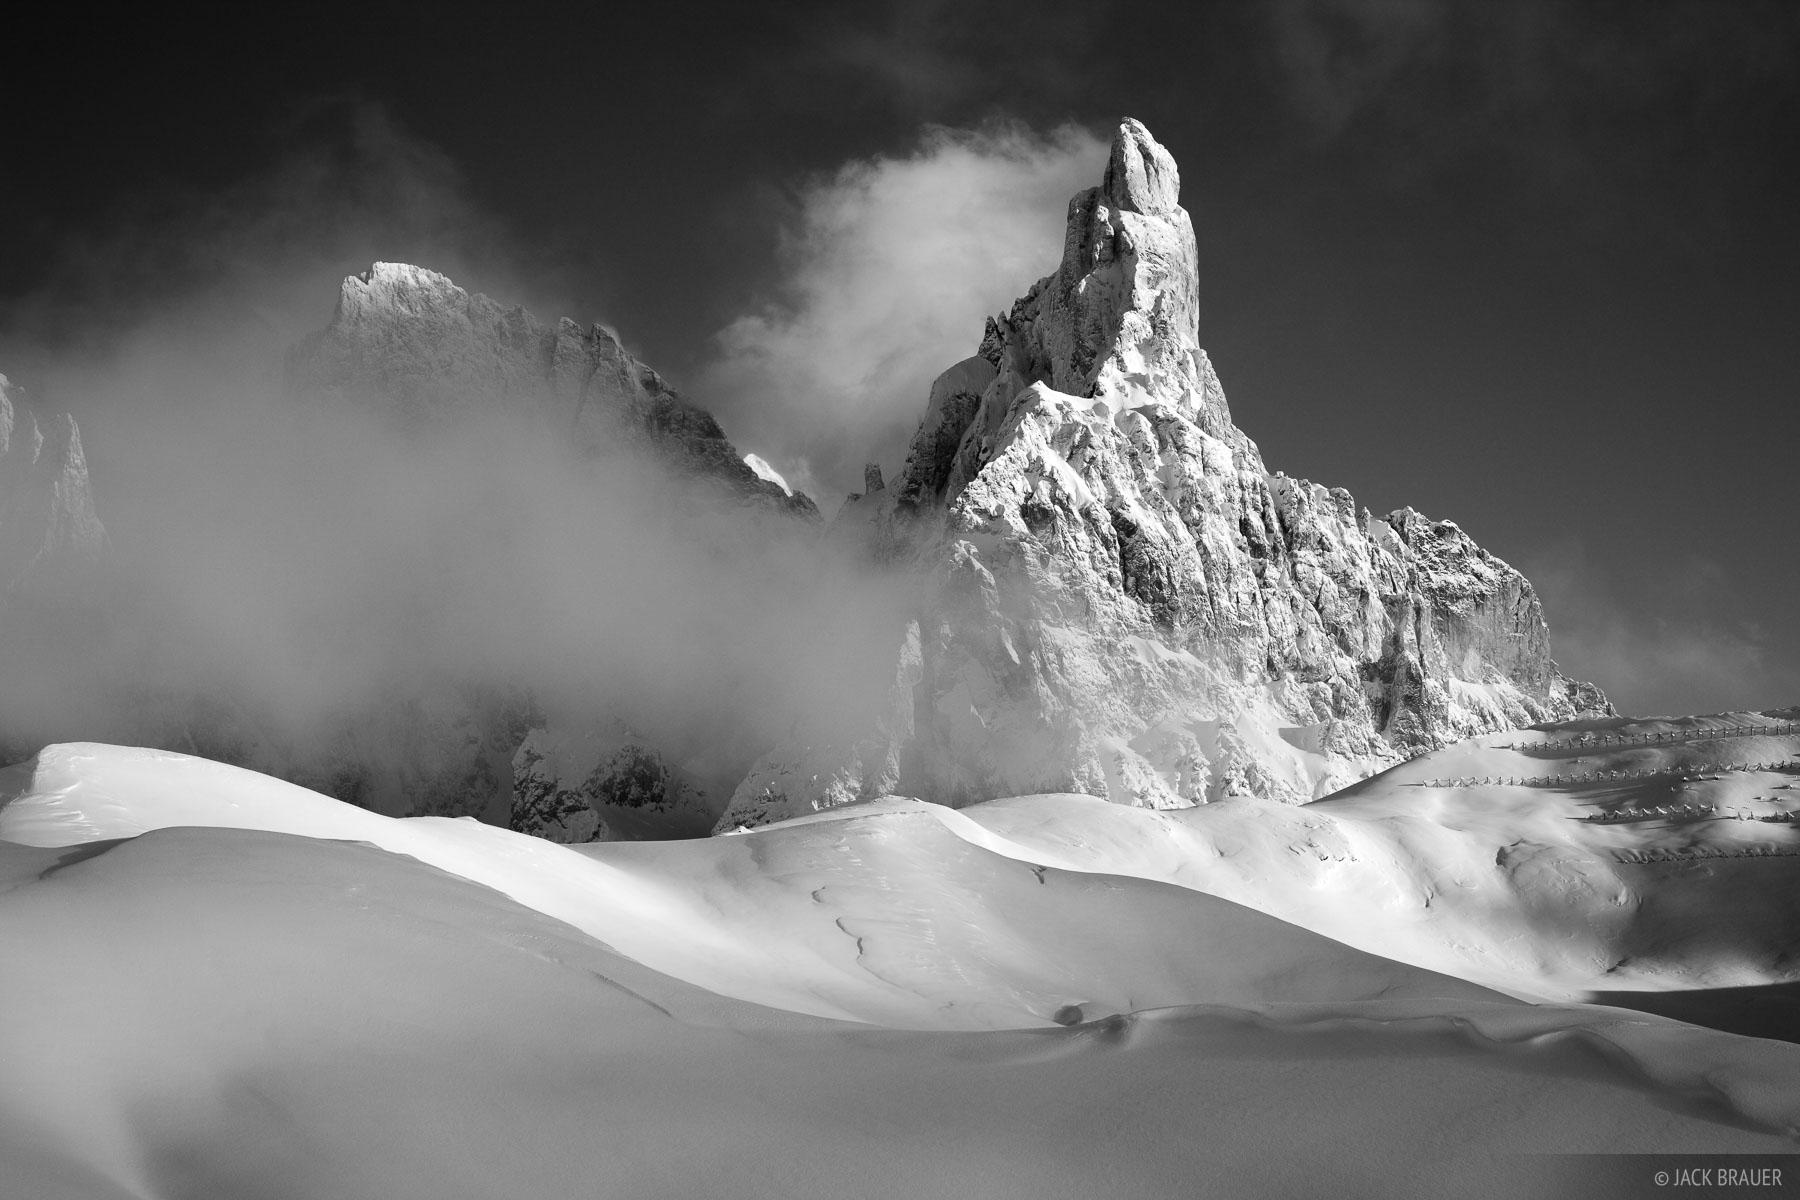 Cimon della Pala, snowy, Dolomites, Italy, December, photo